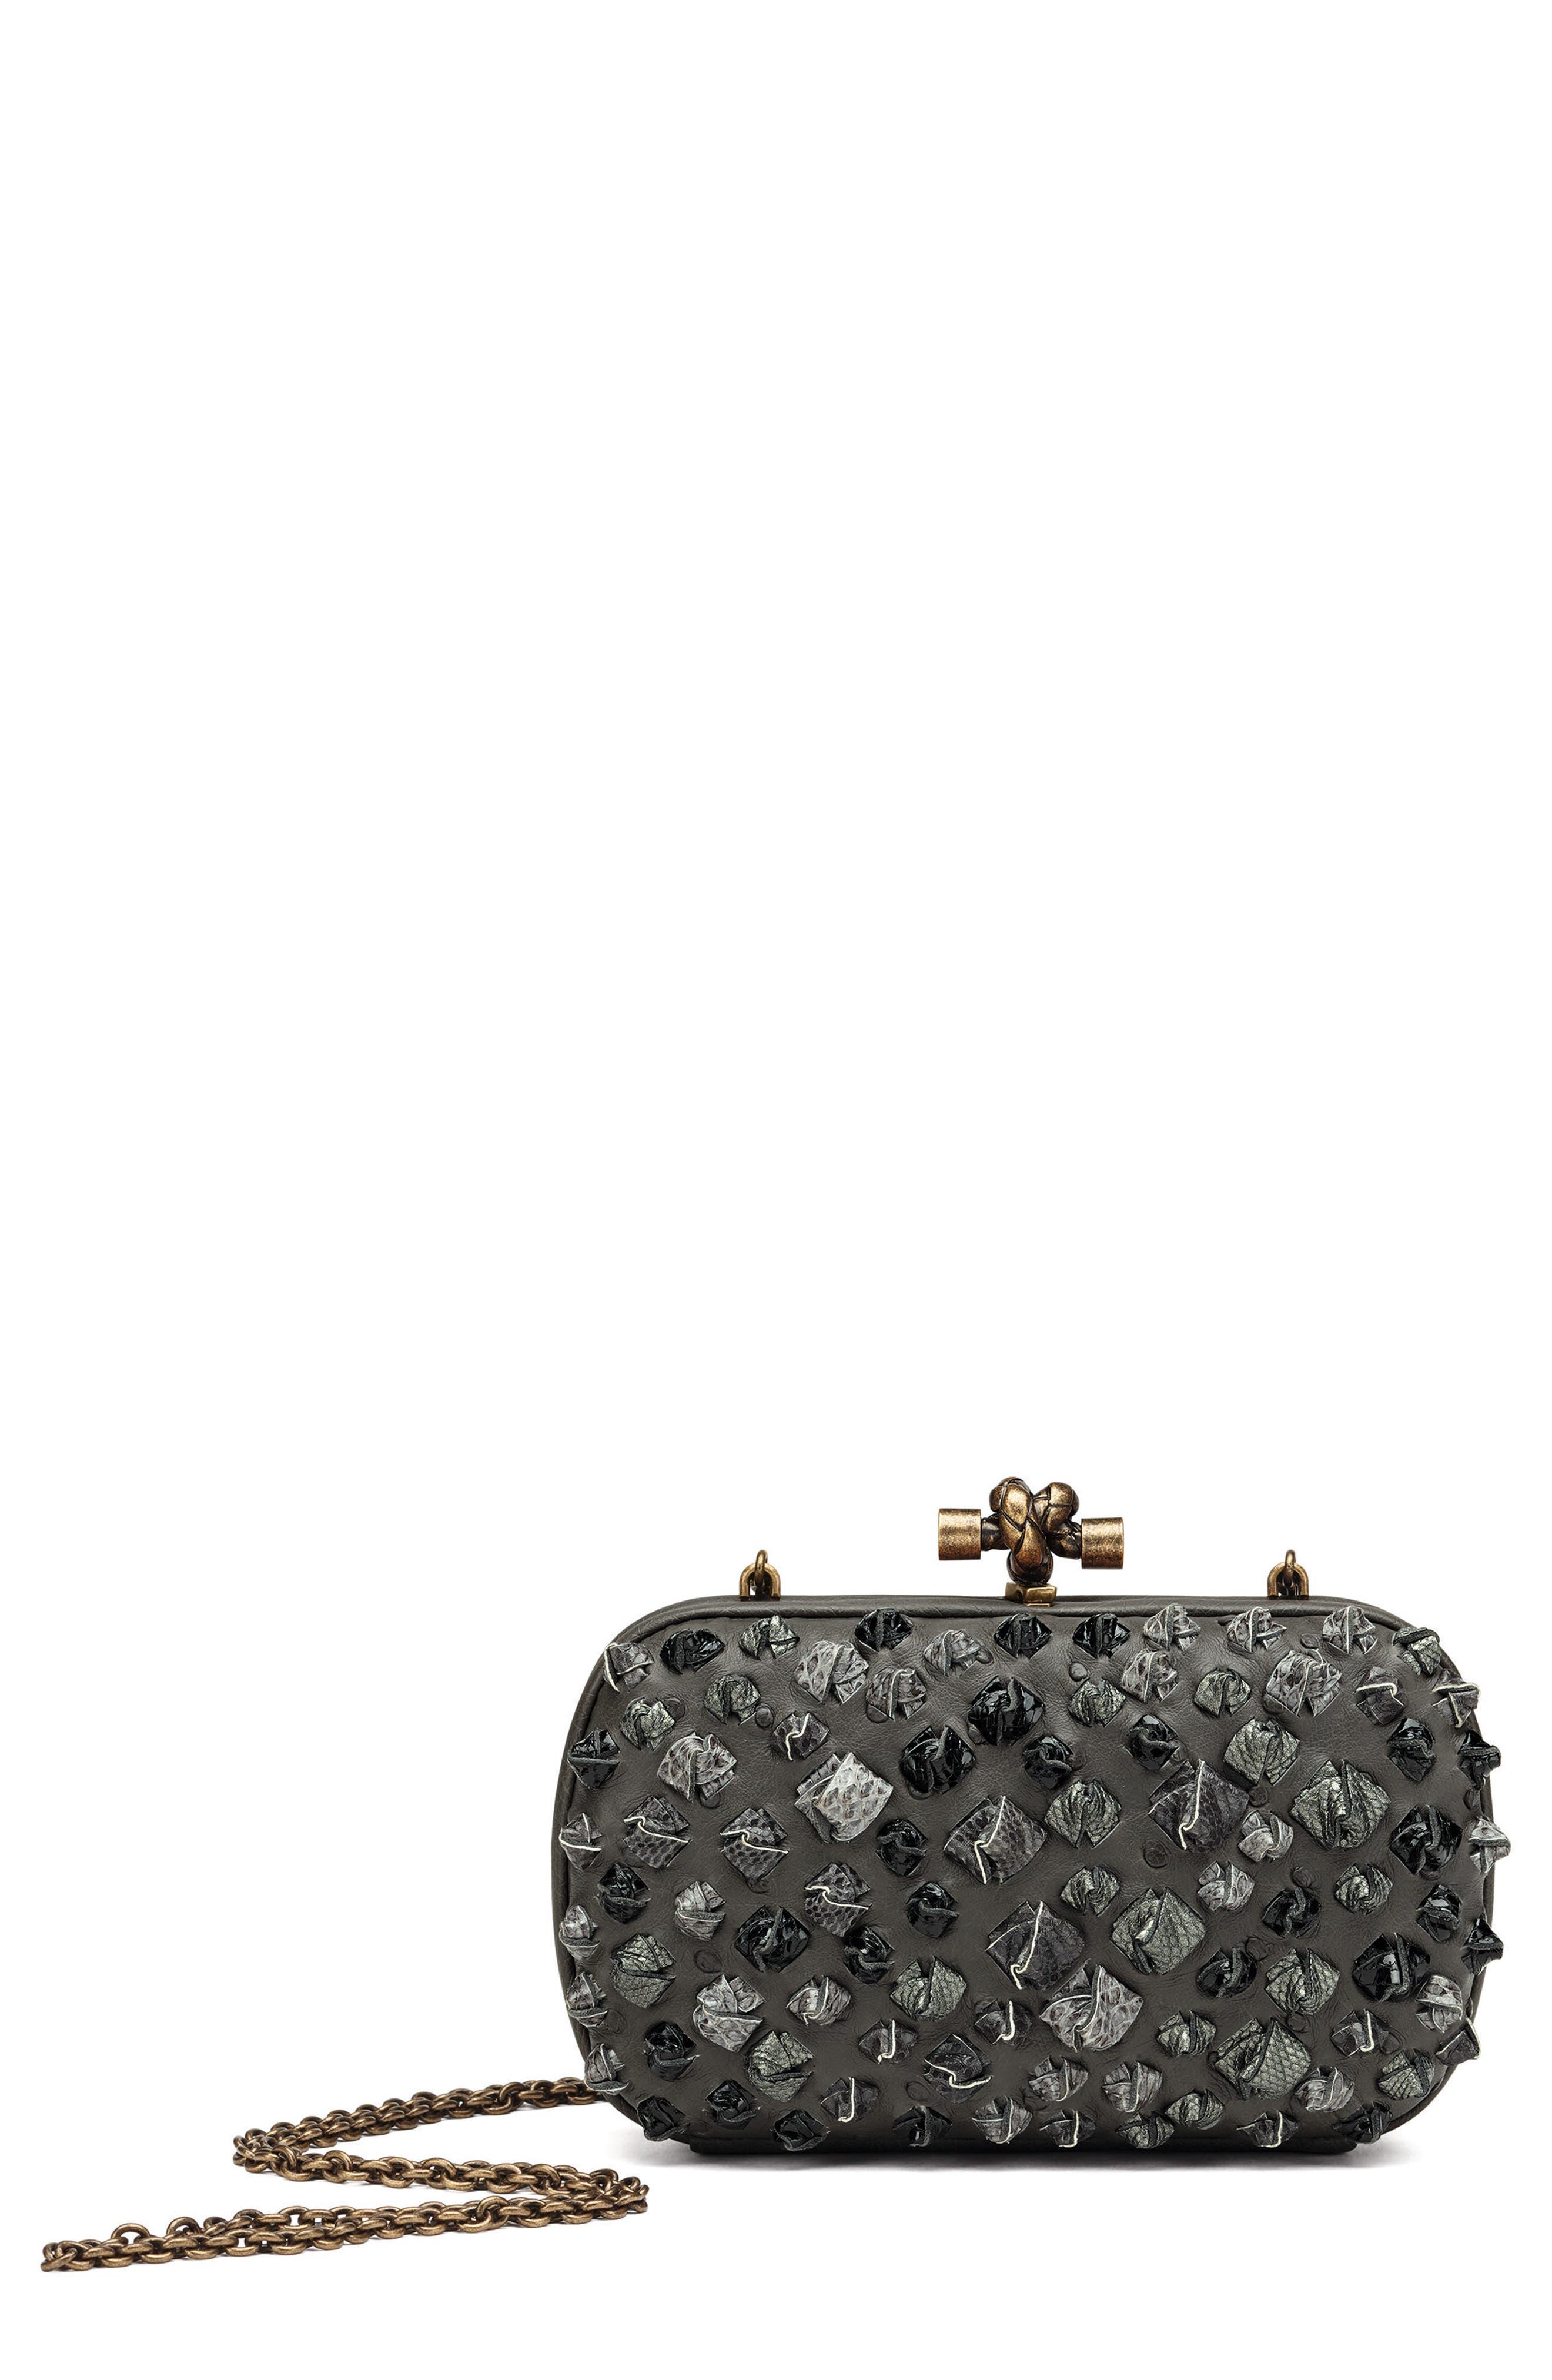 Bottega Veneta Medium Knot Ostrich & Genuine Snakeskin Shoulder Bag